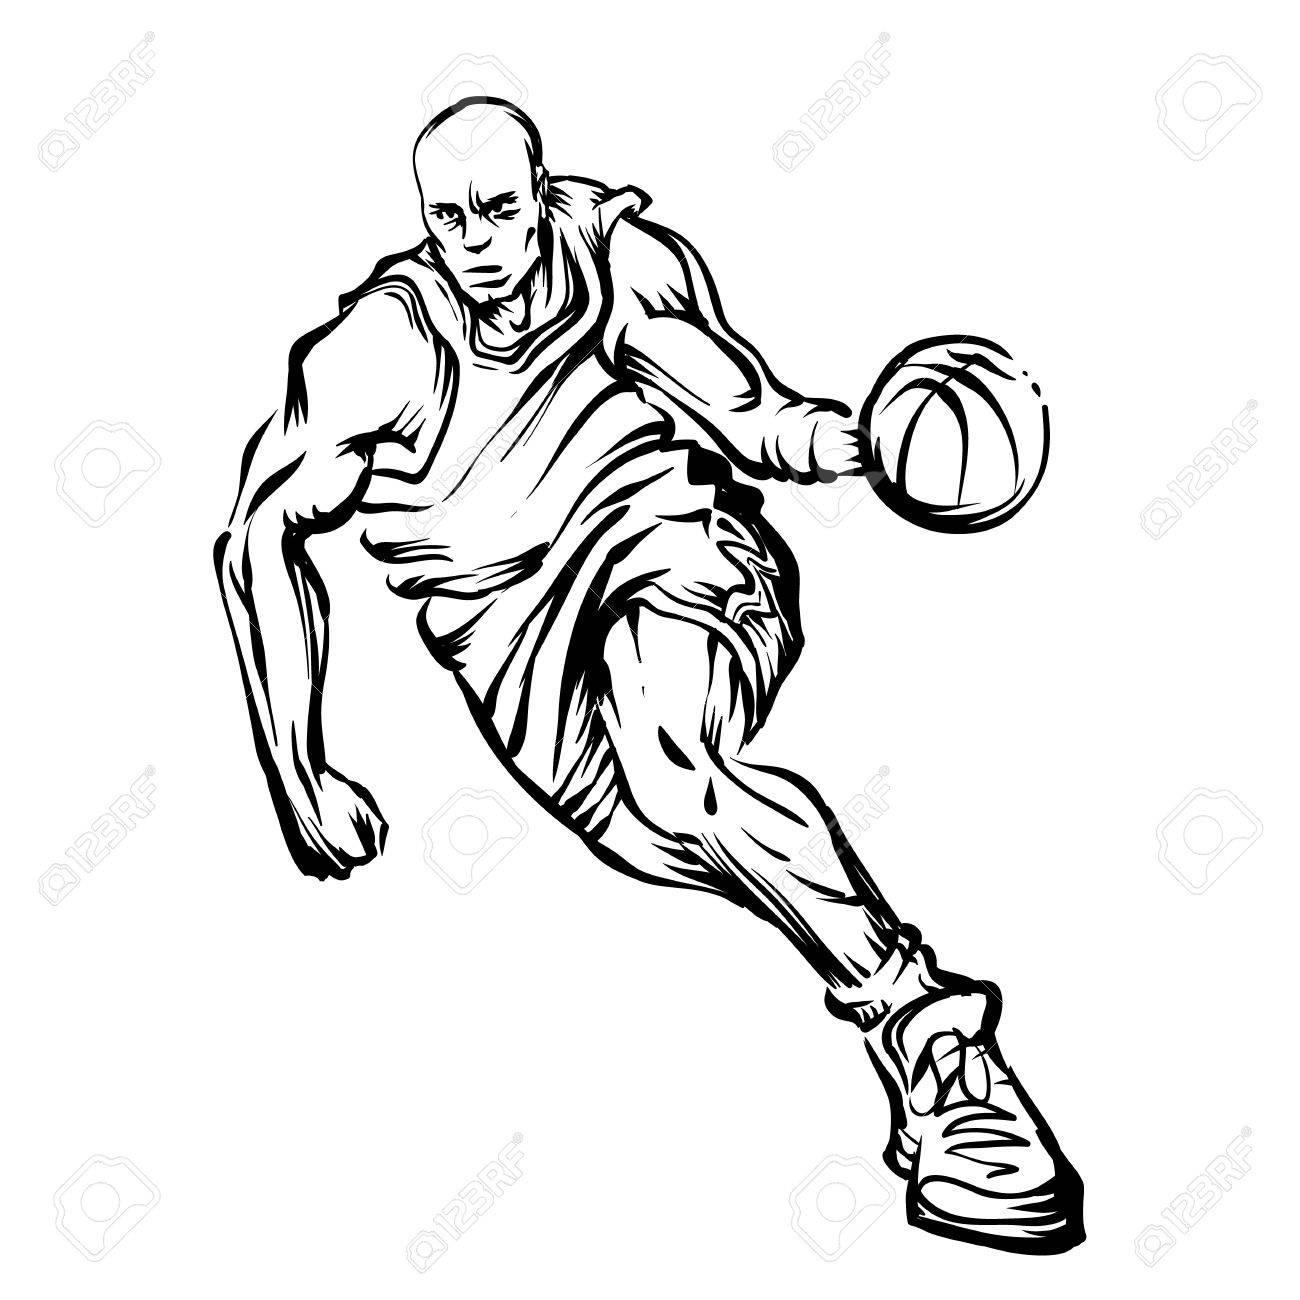 1300x1300 Man Playing Basketball Royalty Free Cliparts, Vectors, And Stock